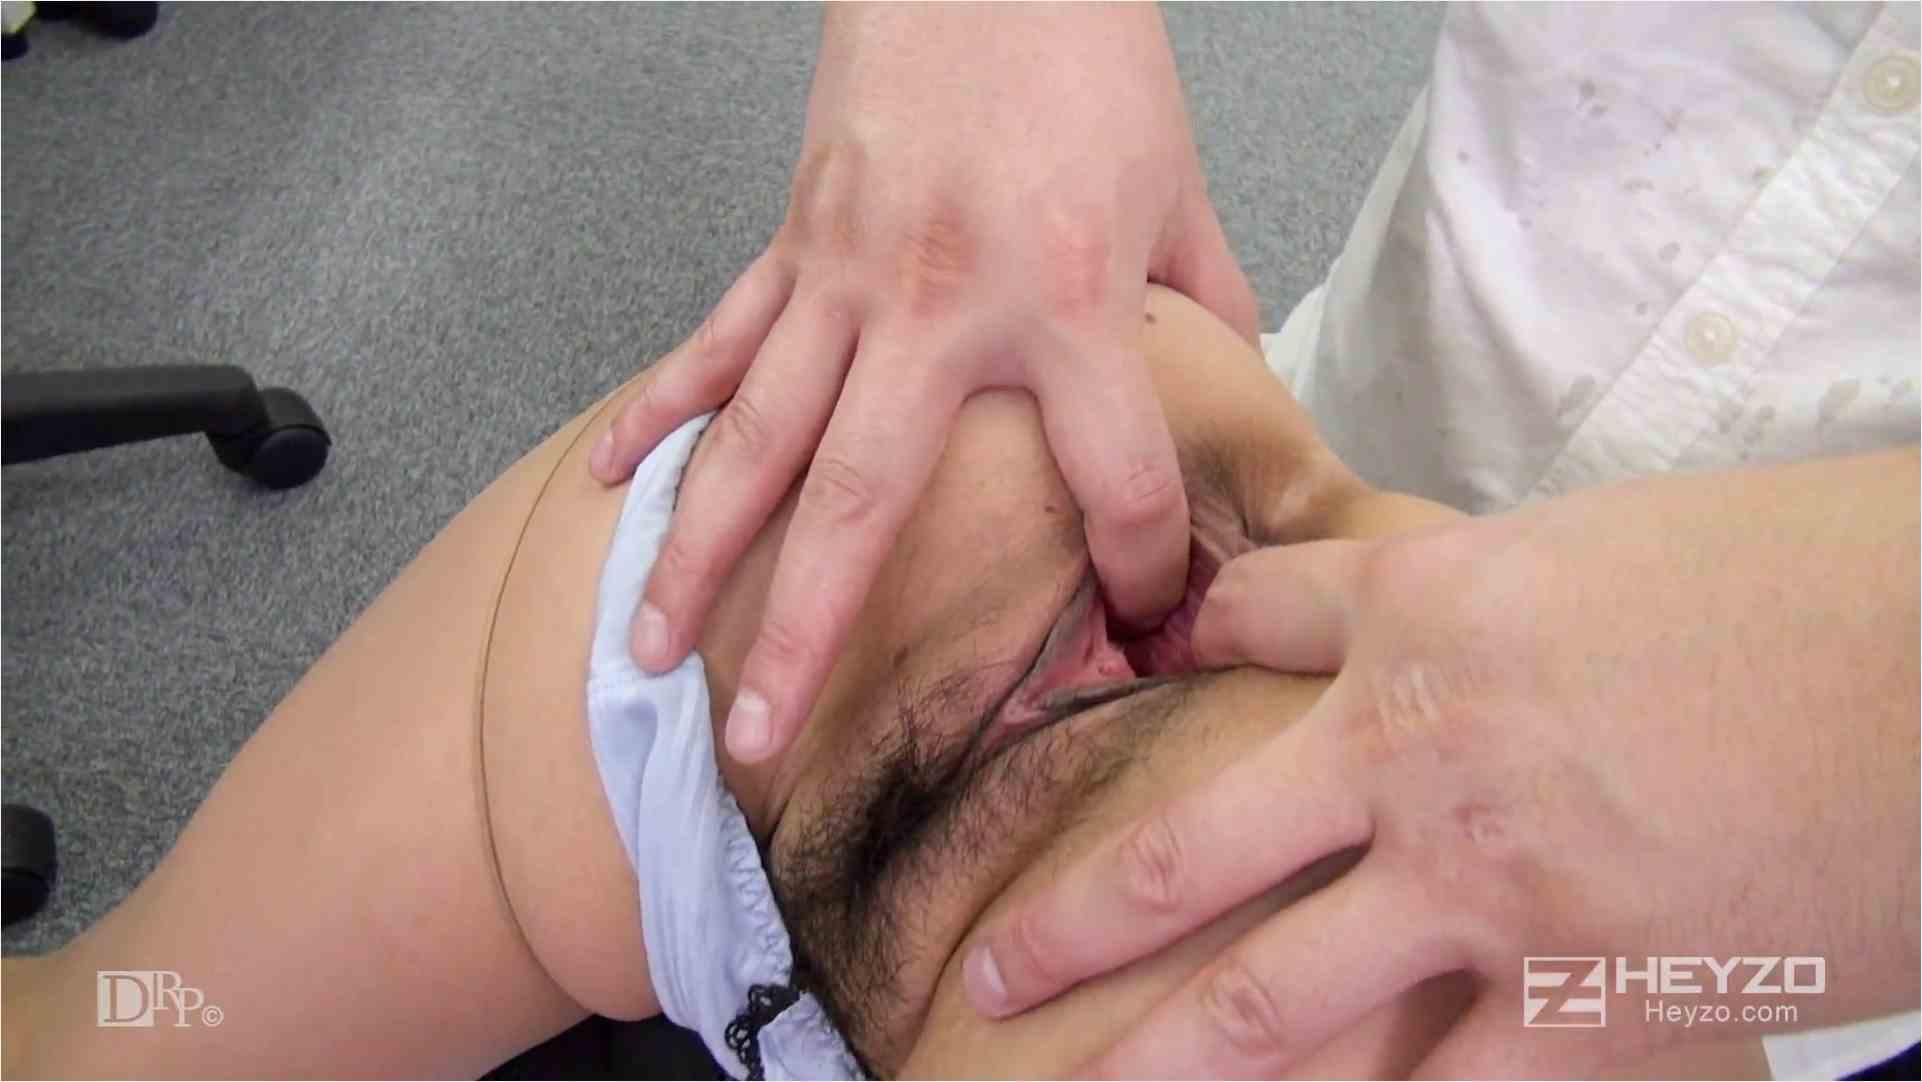 Heyzo-1423-上司にハメられちゃった~背徳感に酔うスレンダーOL~